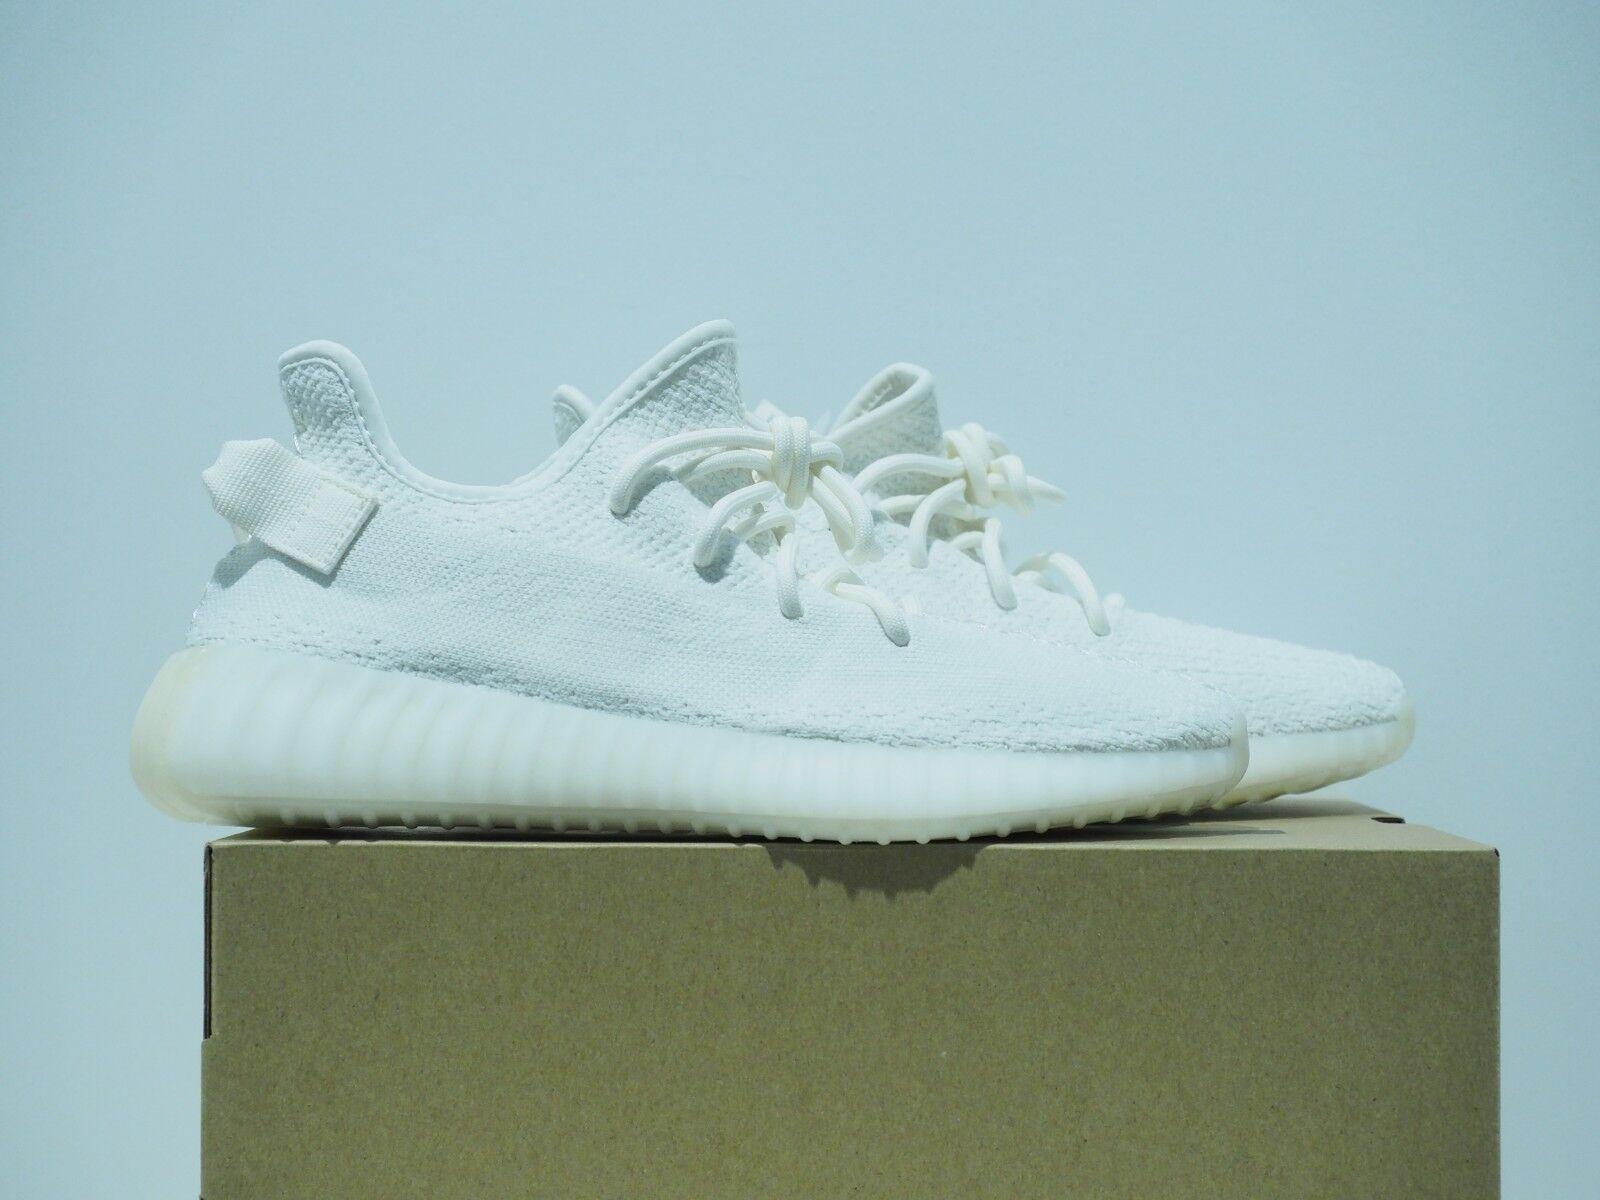 Adidas Yeezy Boost 350 V2 Cream Triple White CP9366 Size 9.5